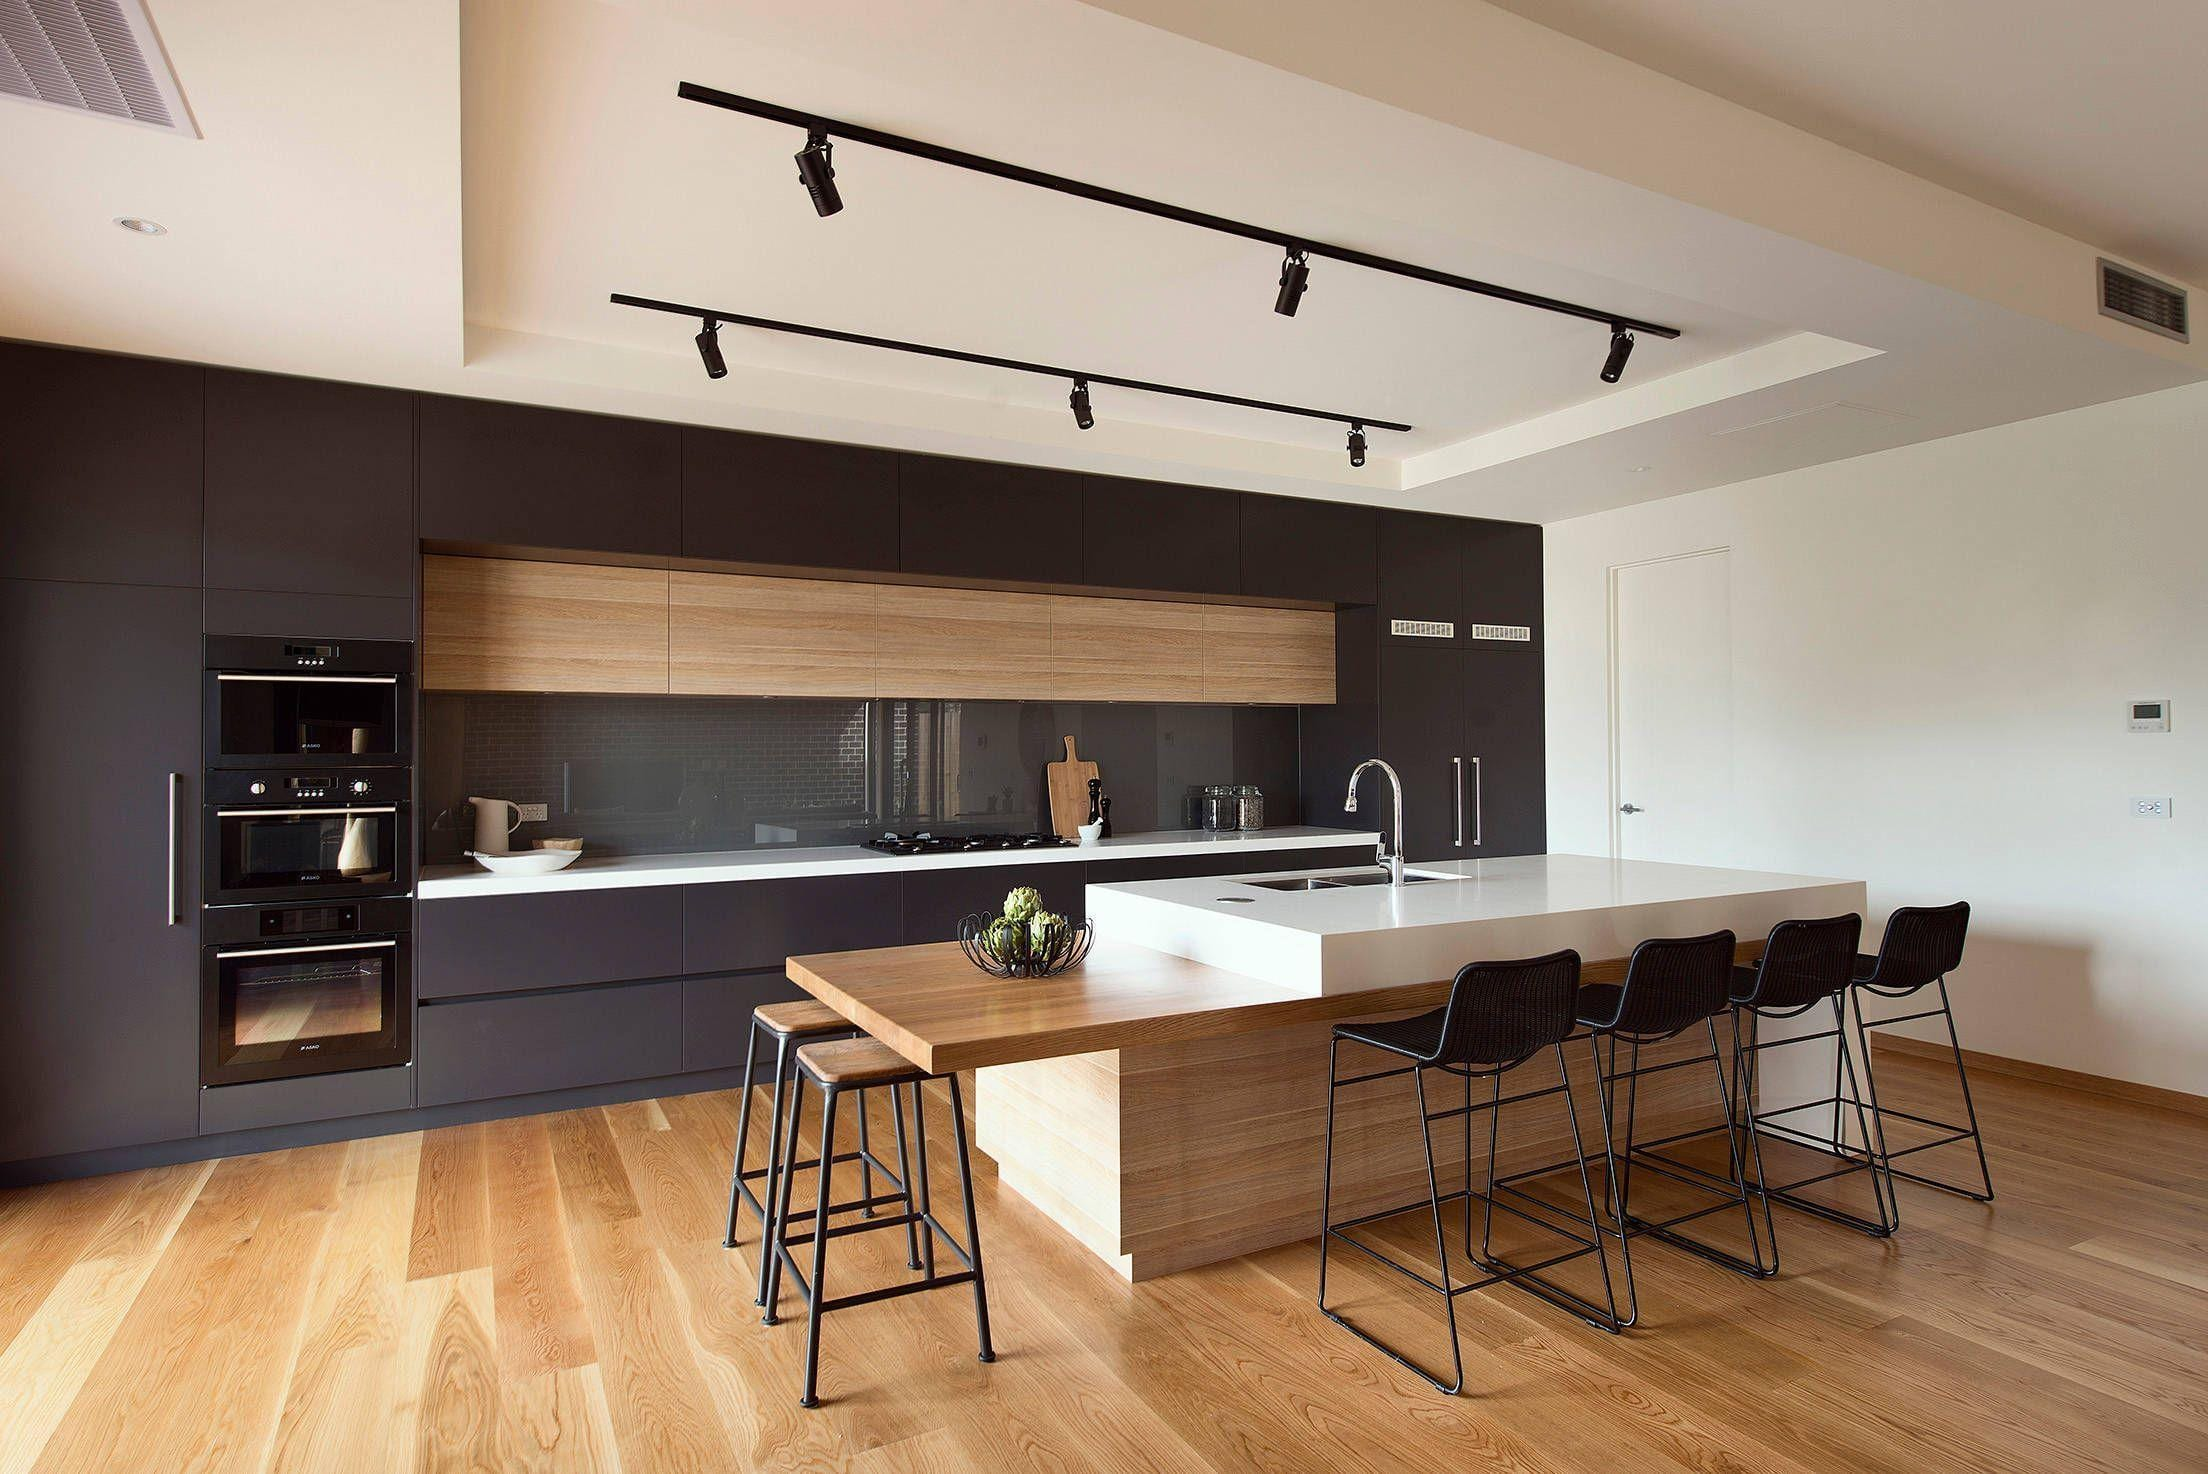 Casas modernas: ideias, dicas, fachadas e projetos (80 fotos) on Interiores De Casas Modernas  id=26559